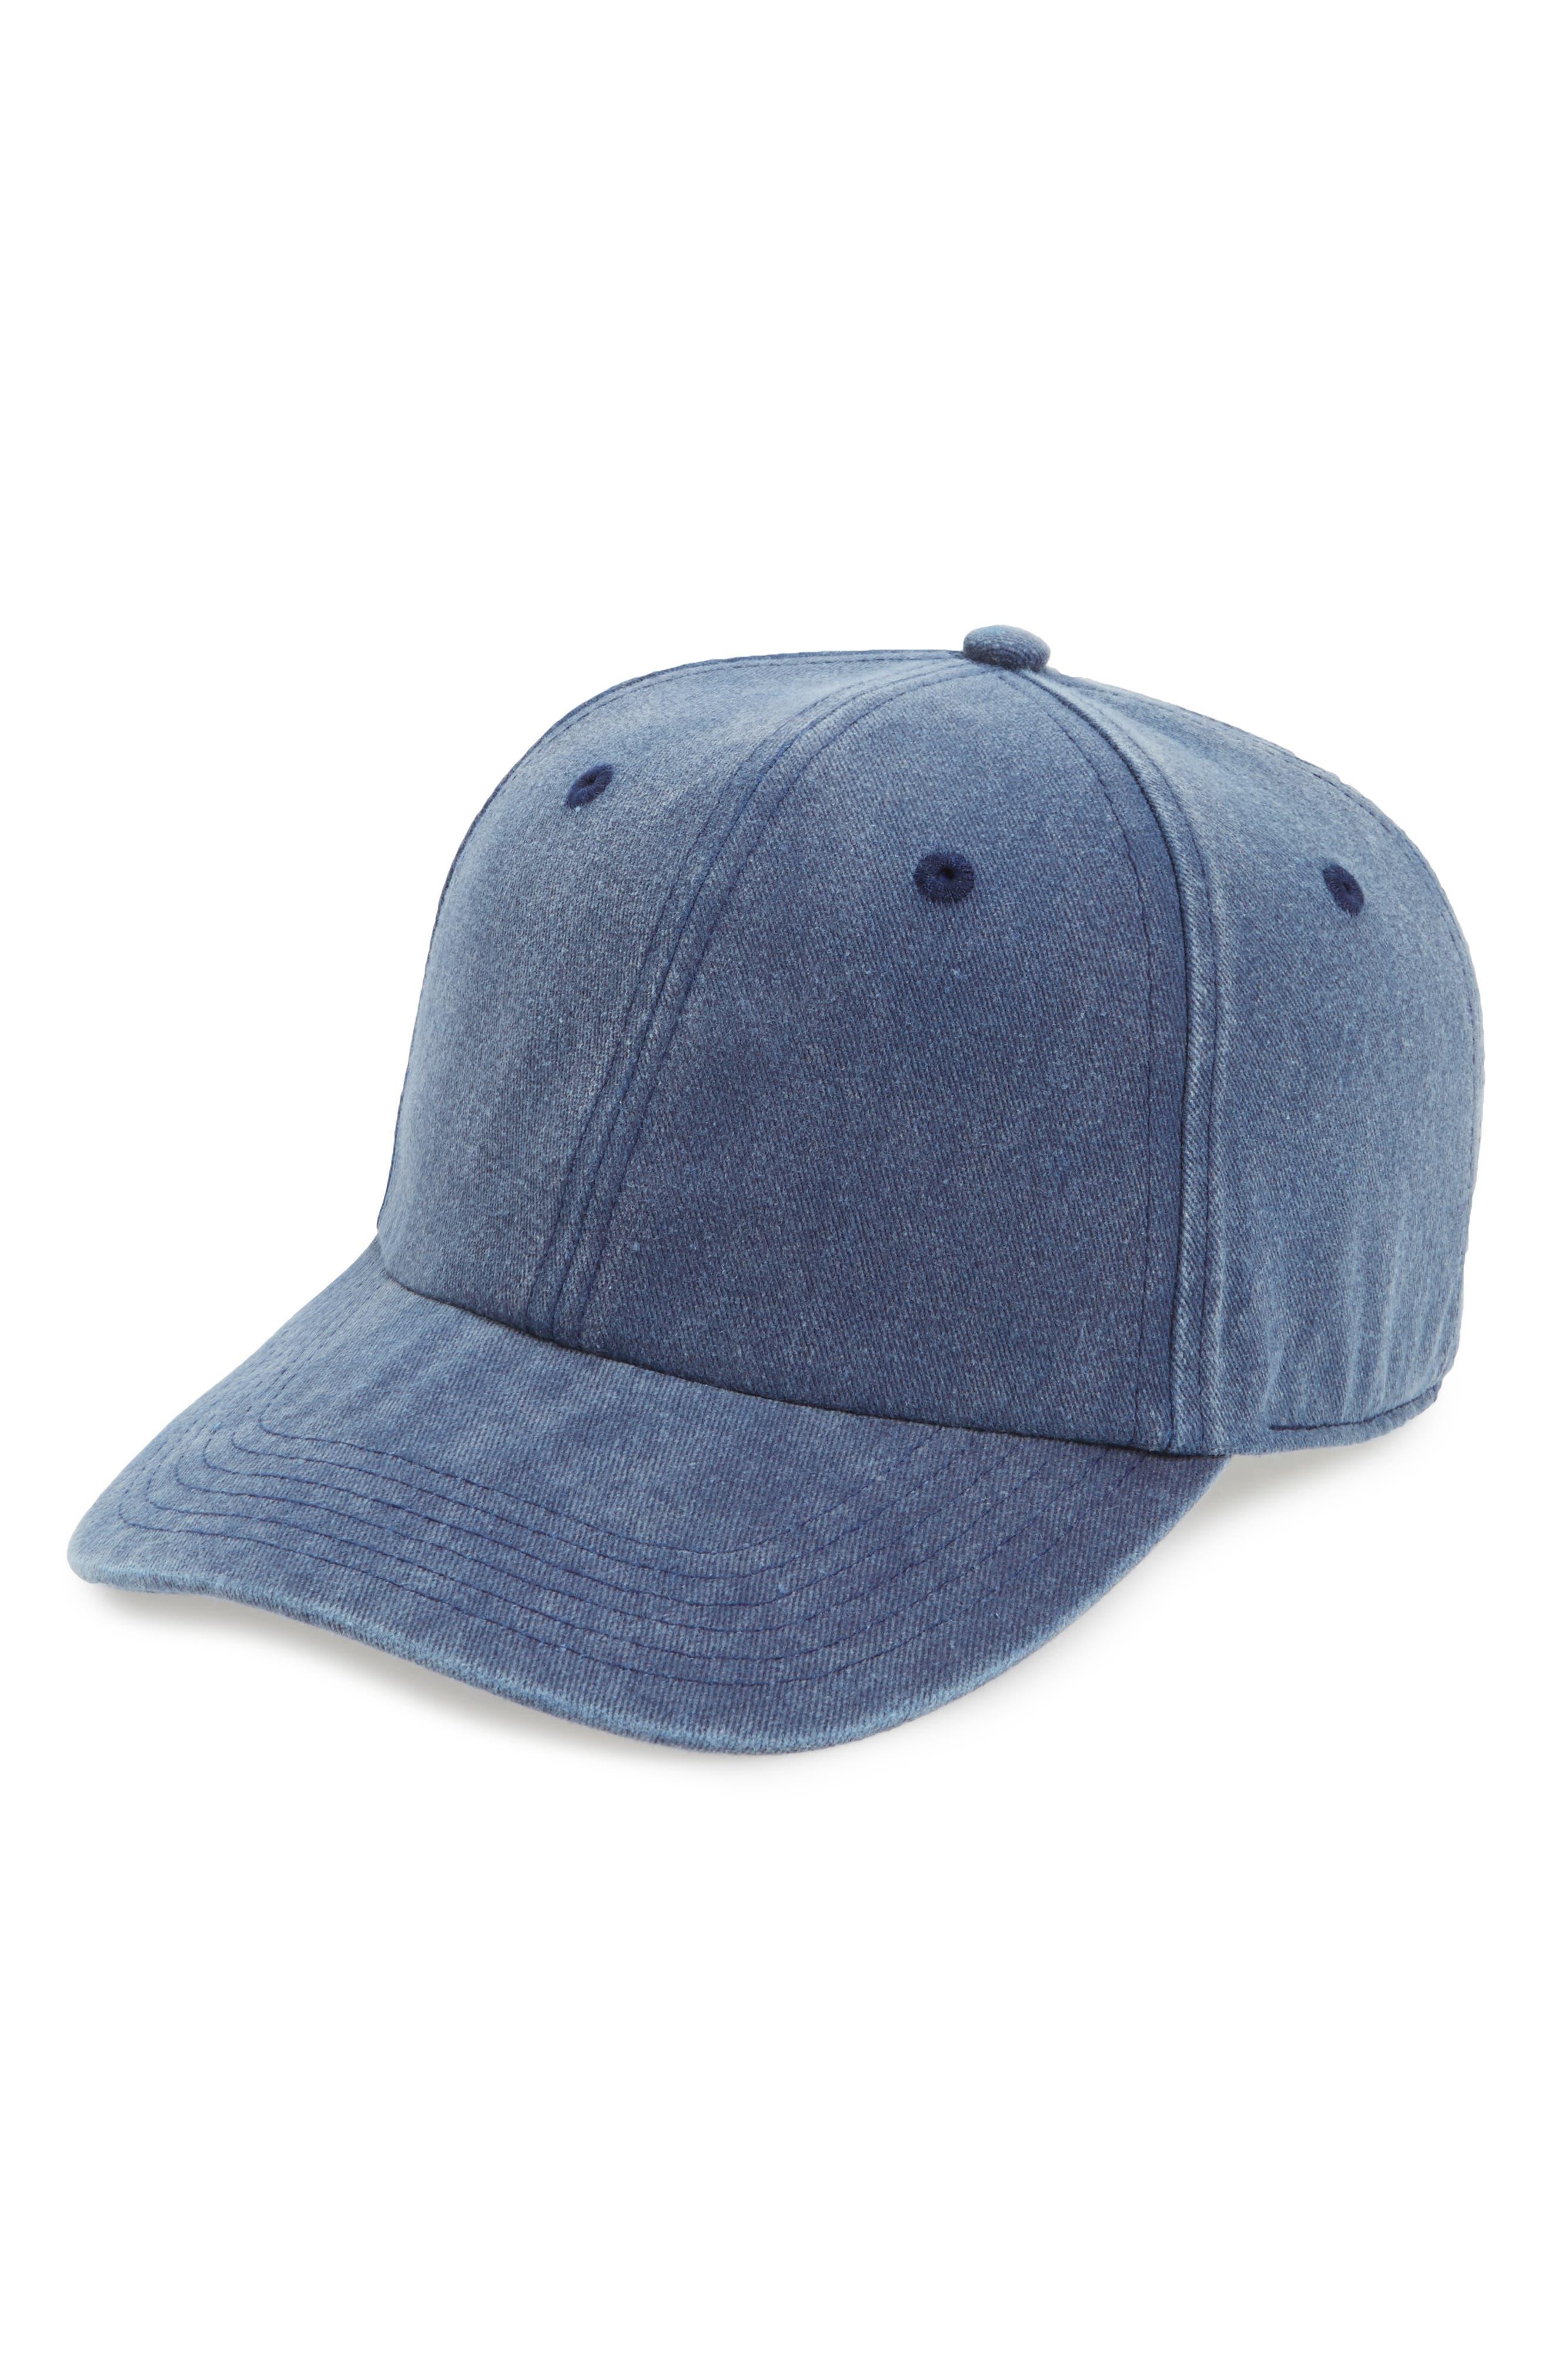 Canvas Baseball Cap,                         Main,                         color, Dark Denim